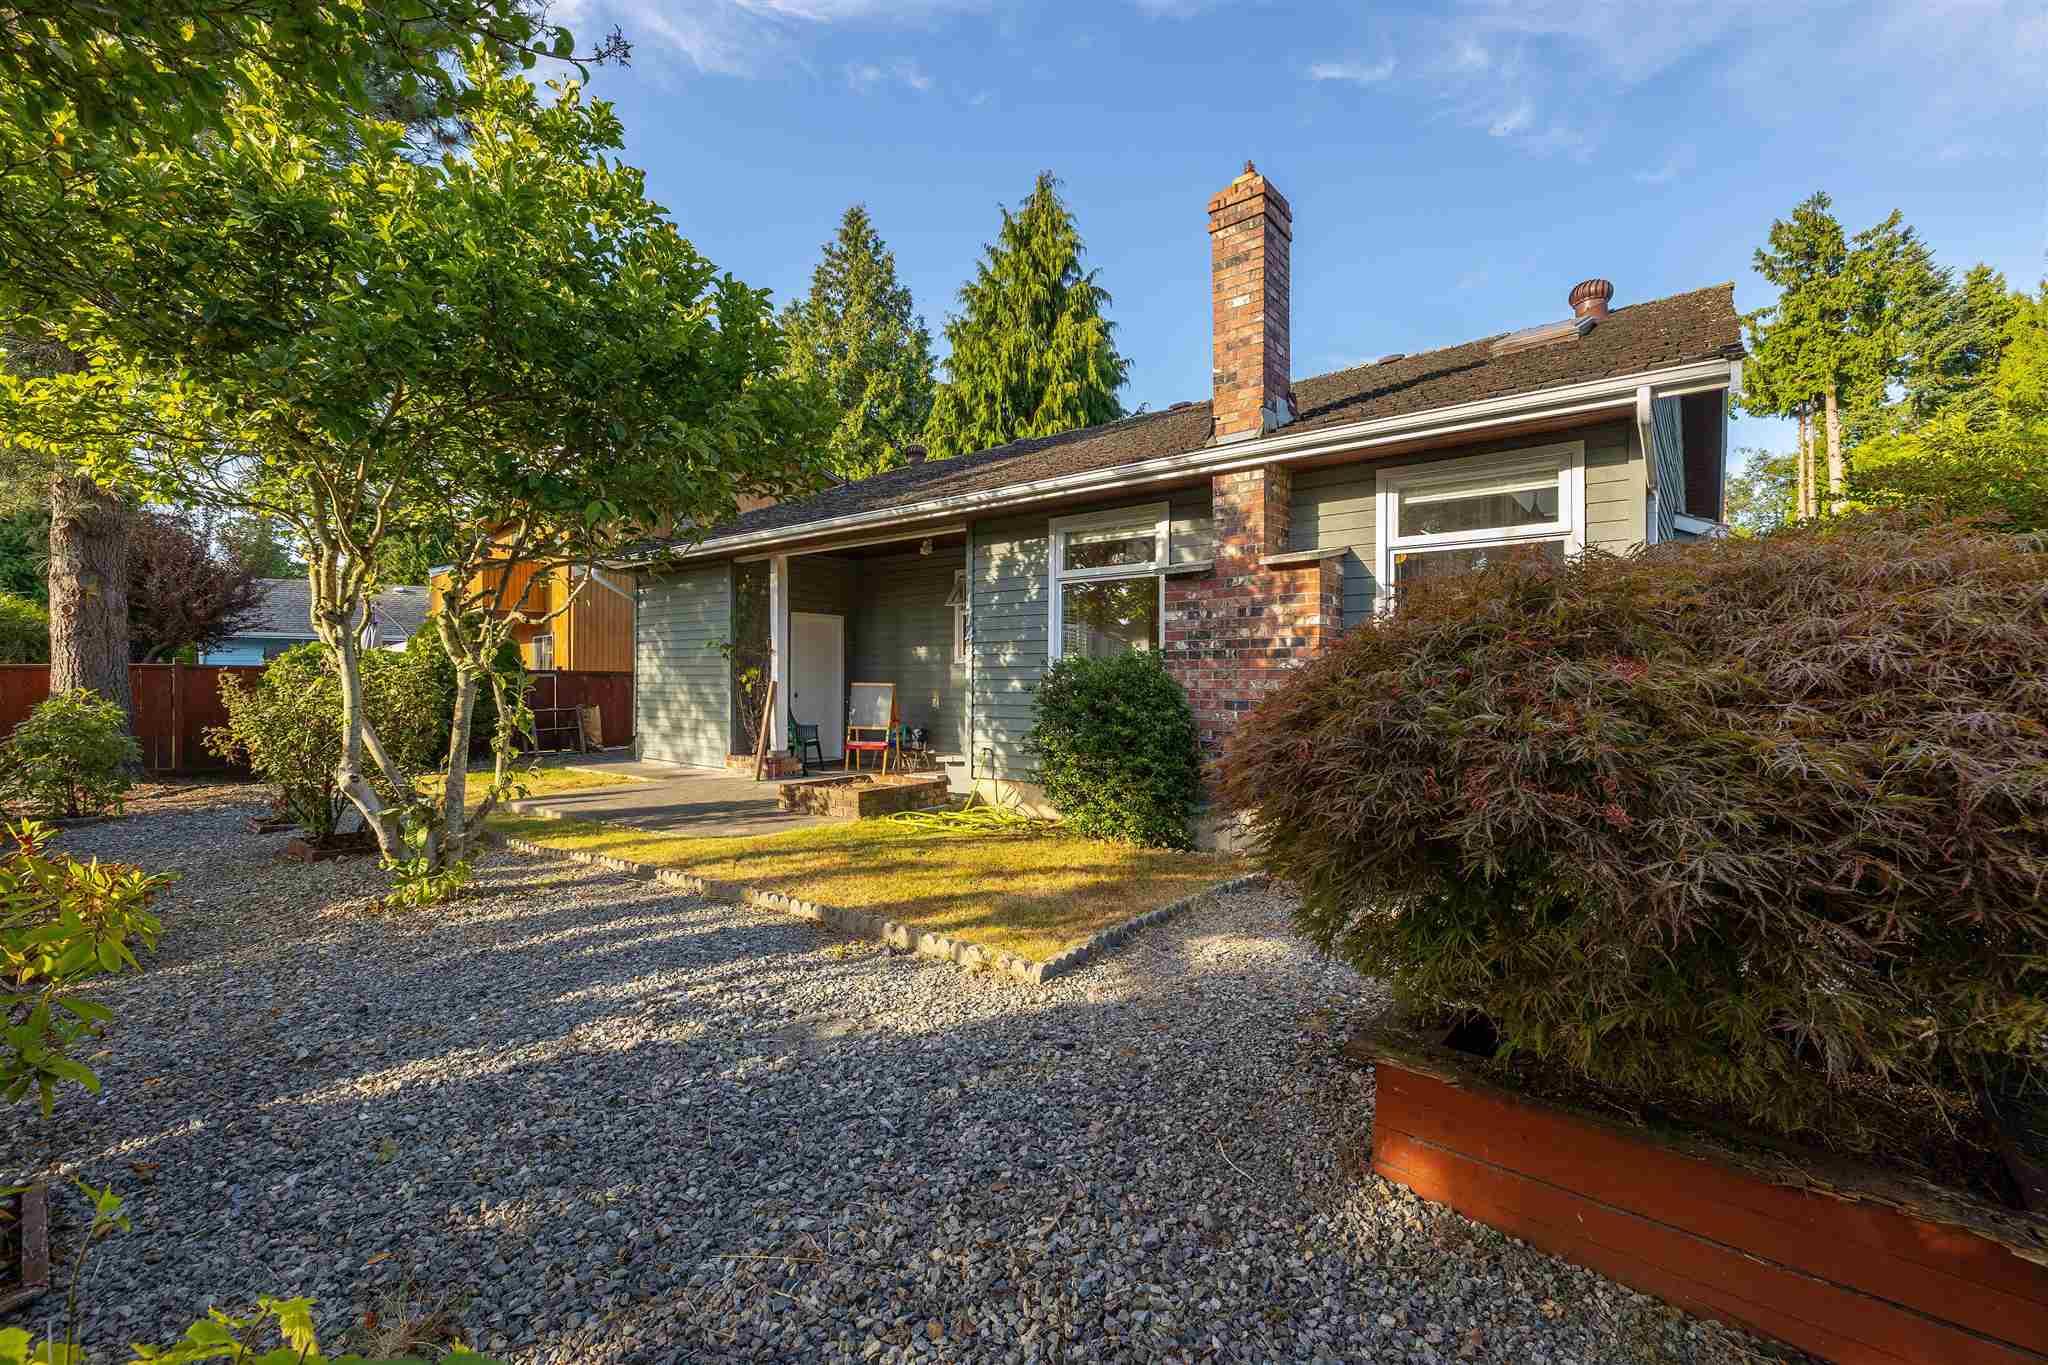 1743 148A STREET - Sunnyside Park Surrey House/Single Family for sale, 3 Bedrooms (R2604804) - #21